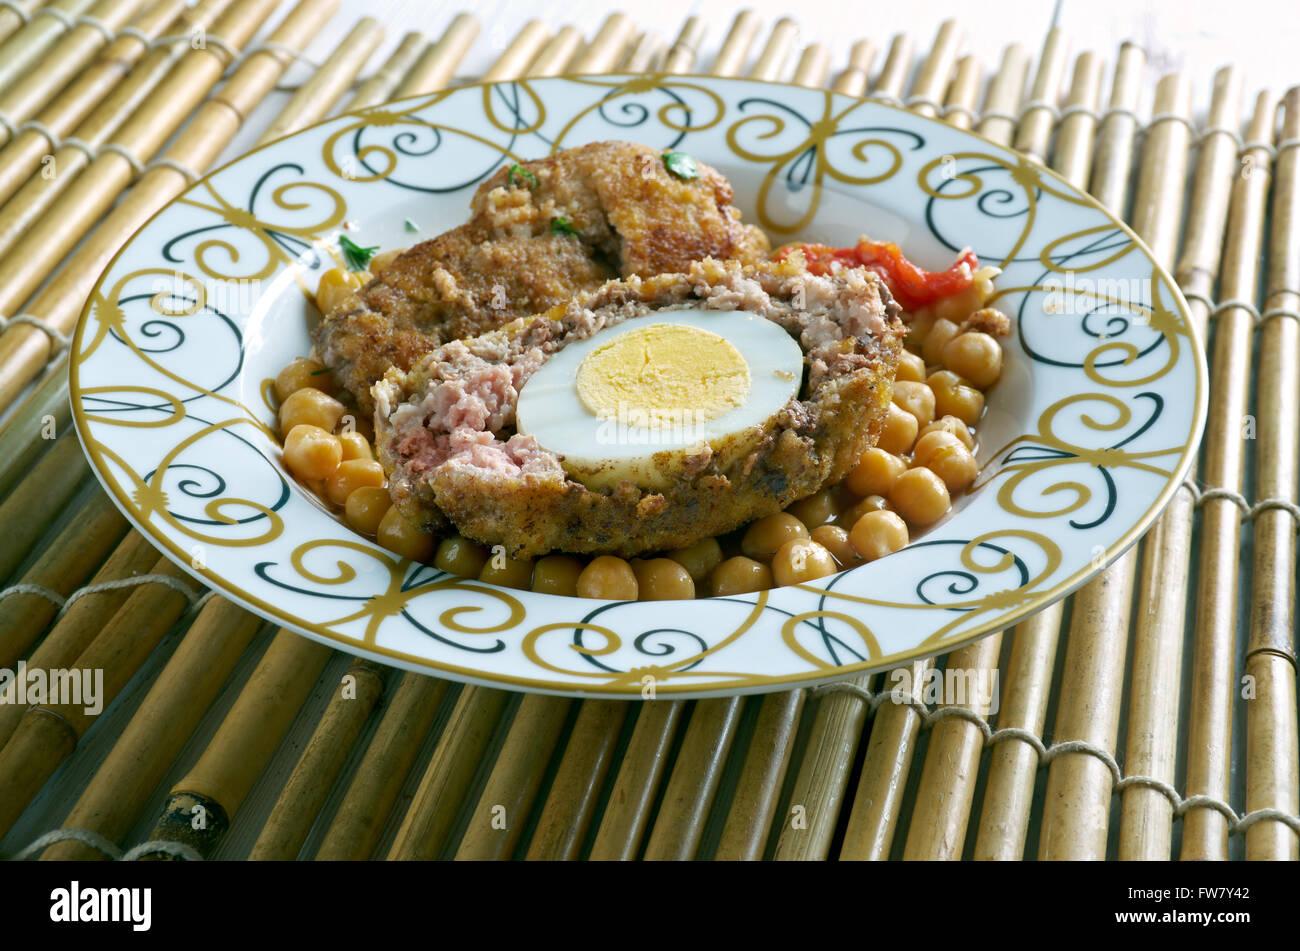 Kufteh Tabrizi - Persian, is an Iranian meatball recipe from